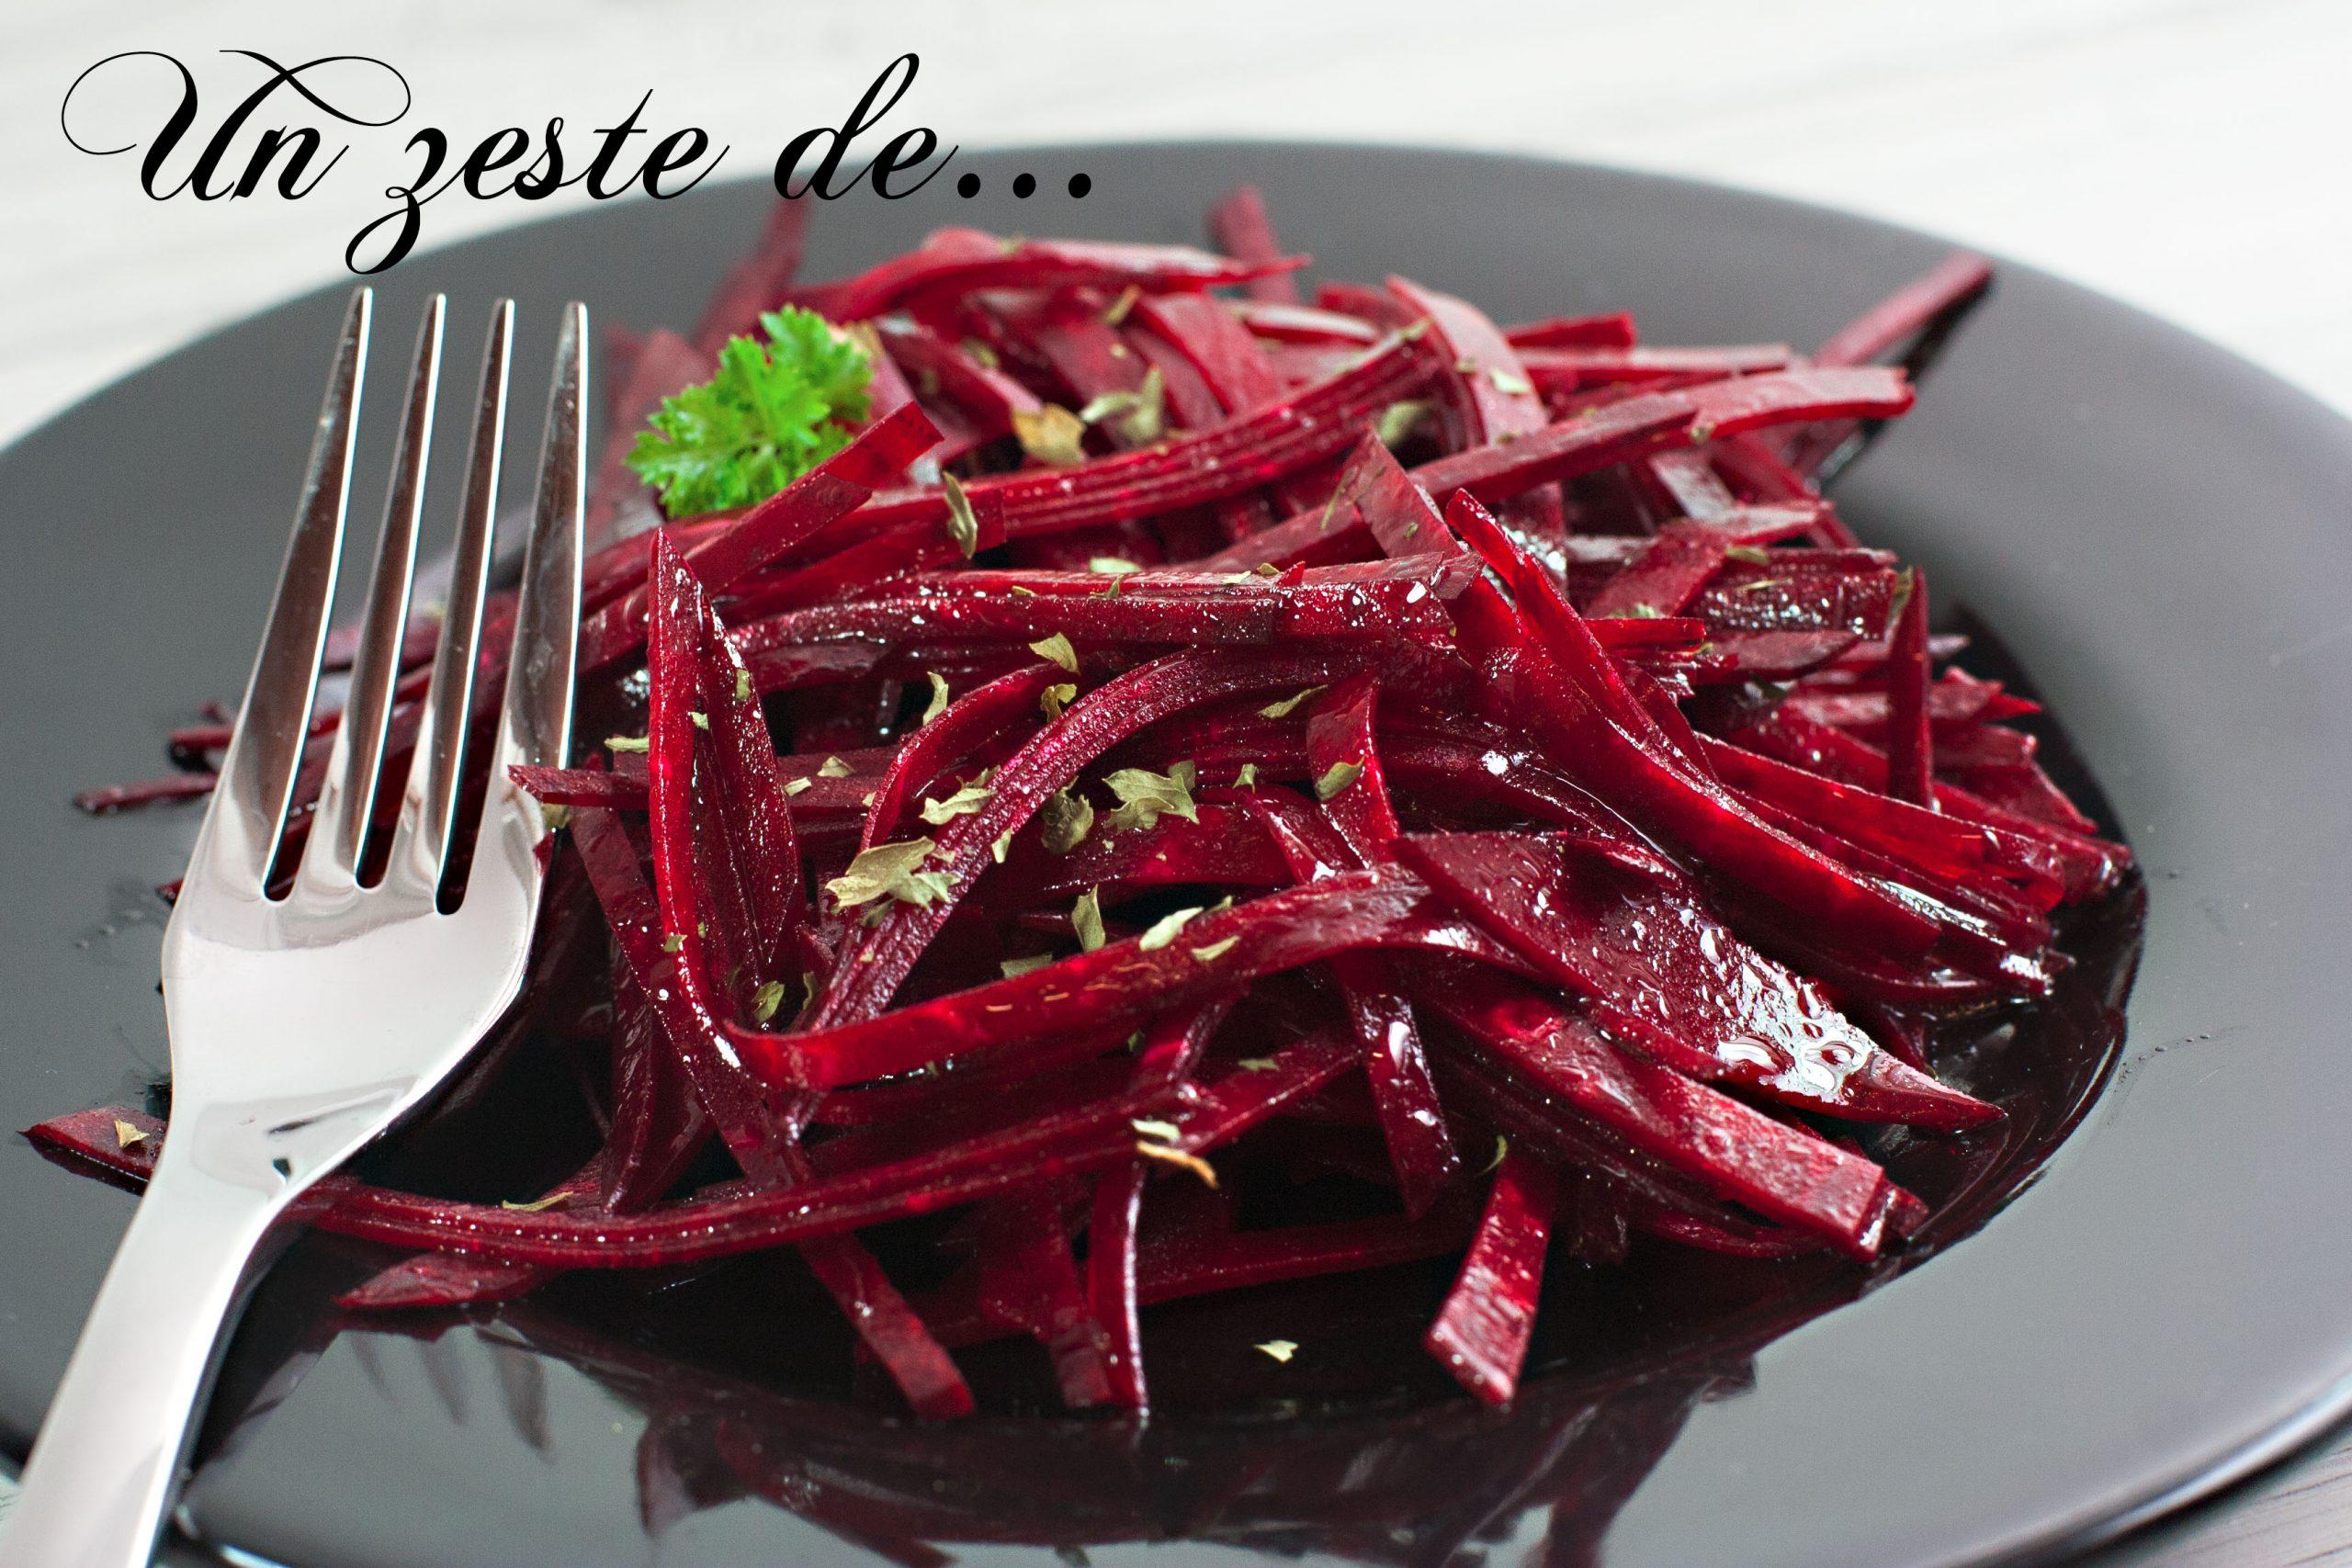 Salade de betterave rouge crue